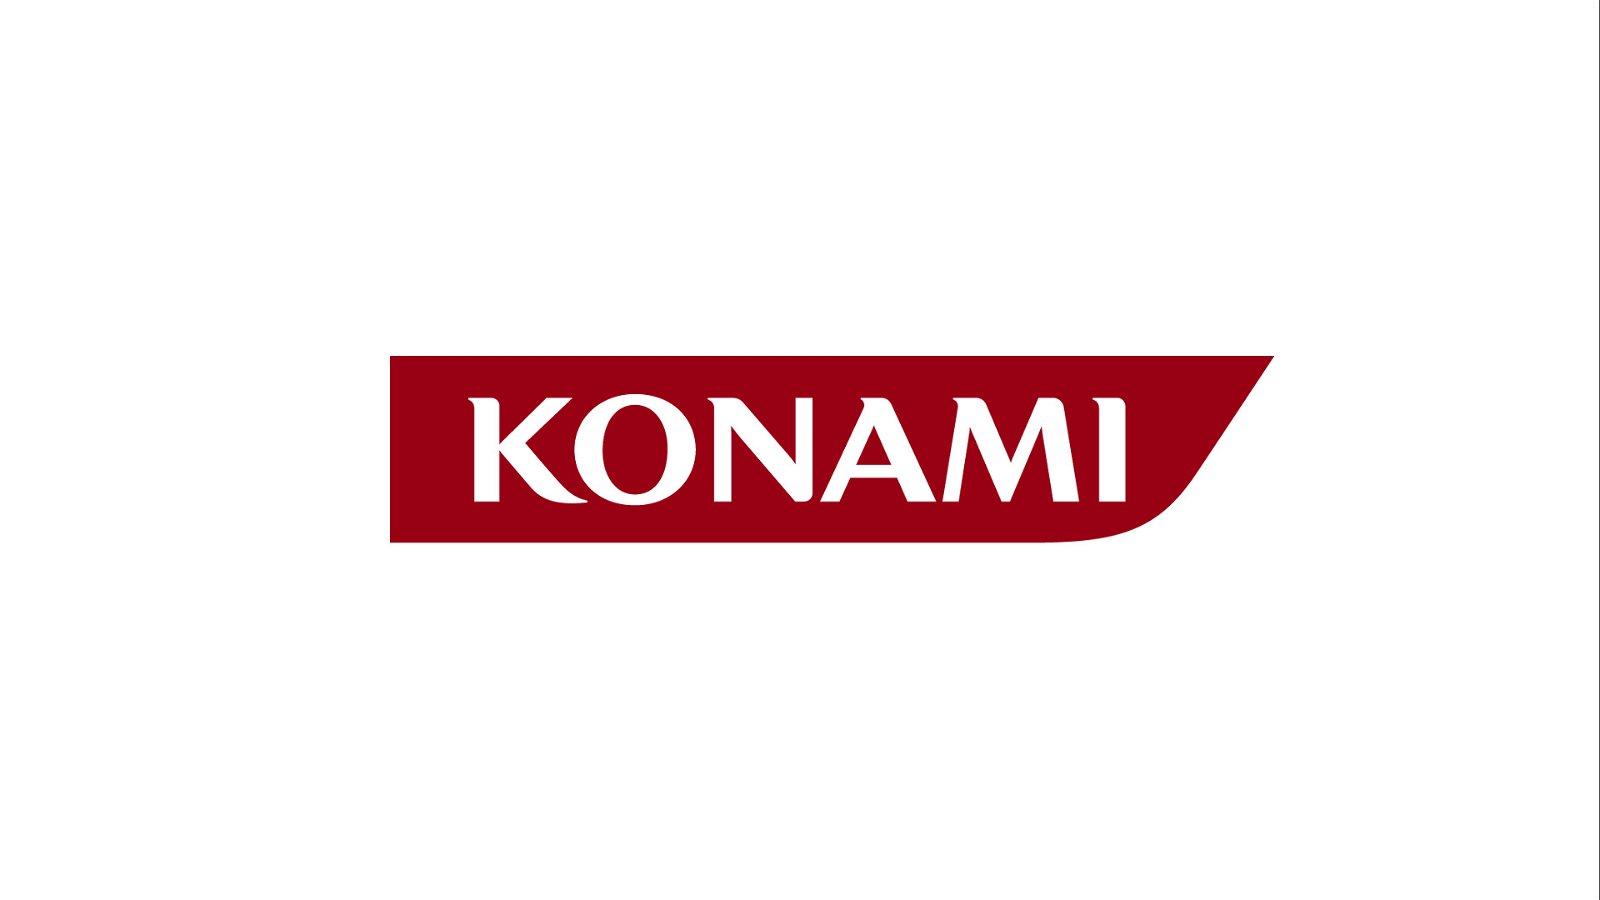 Konami Profits Show Mobile Focus is Paying Off